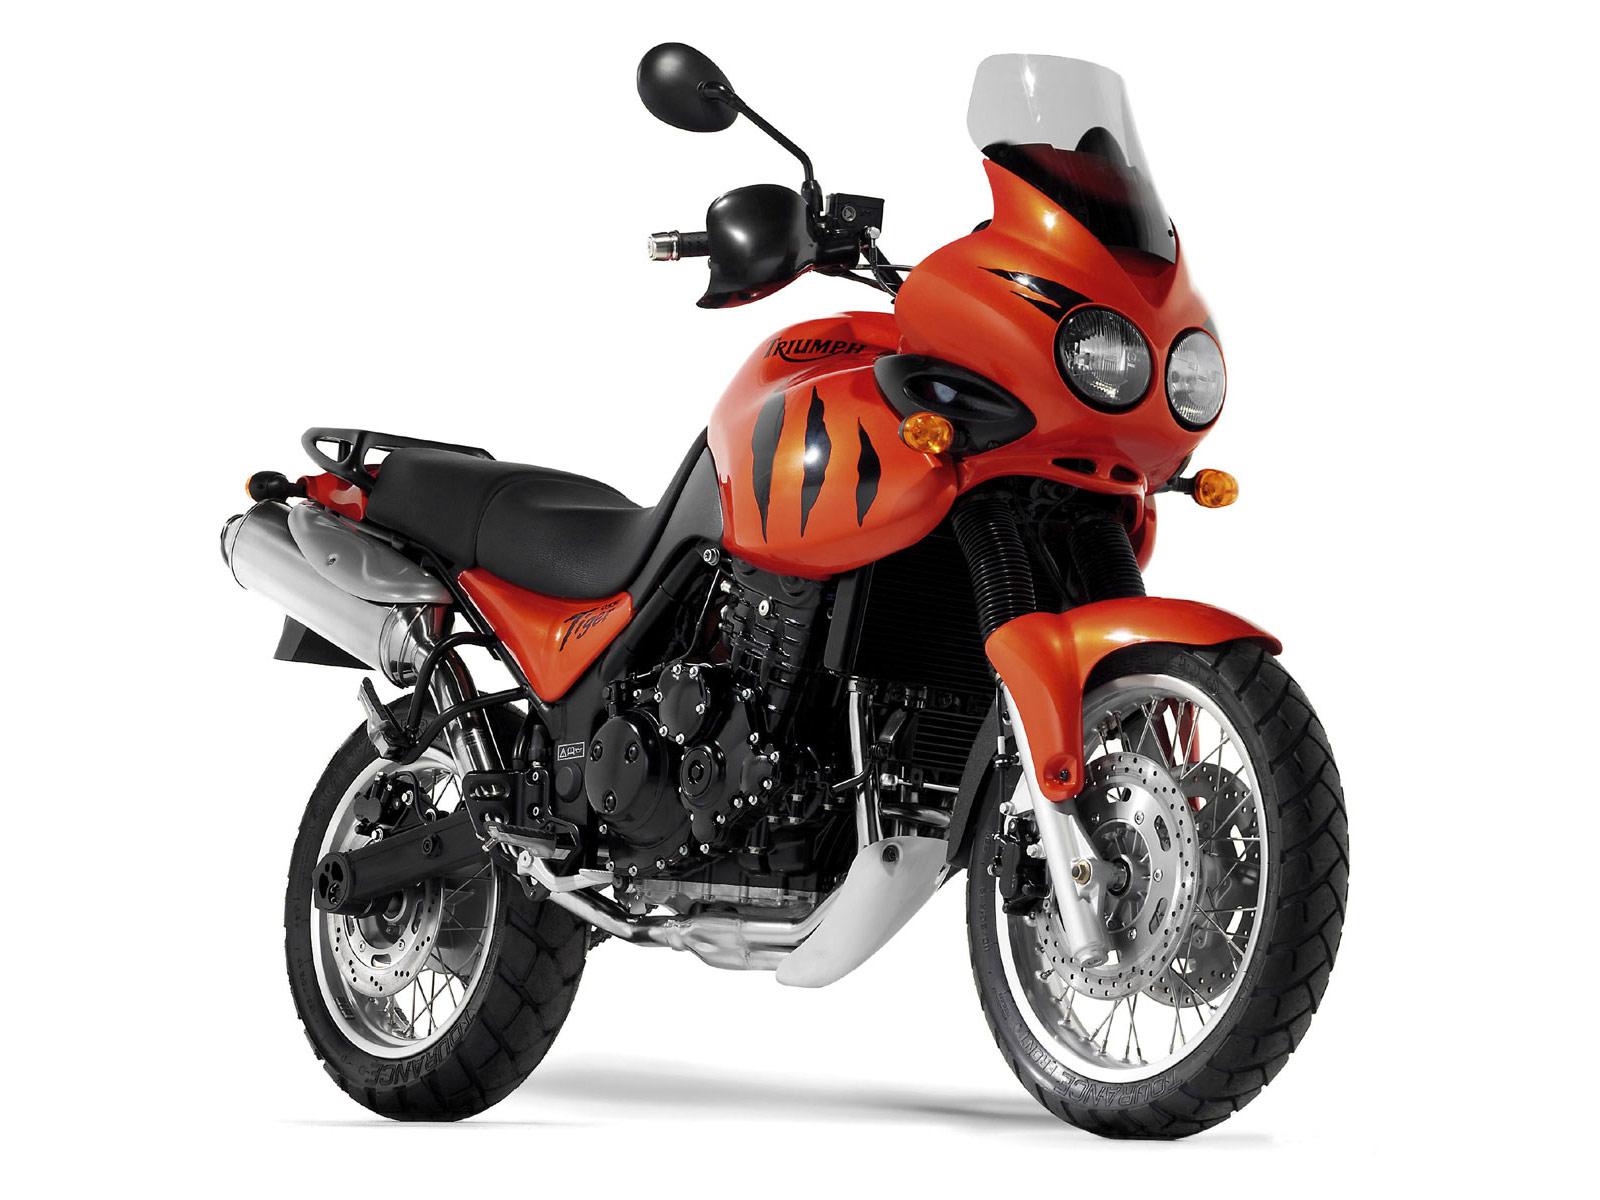 1999 victory 92 wiring diagram gambar motor triumph tiger  2003   gambar motor triumph tiger  2003